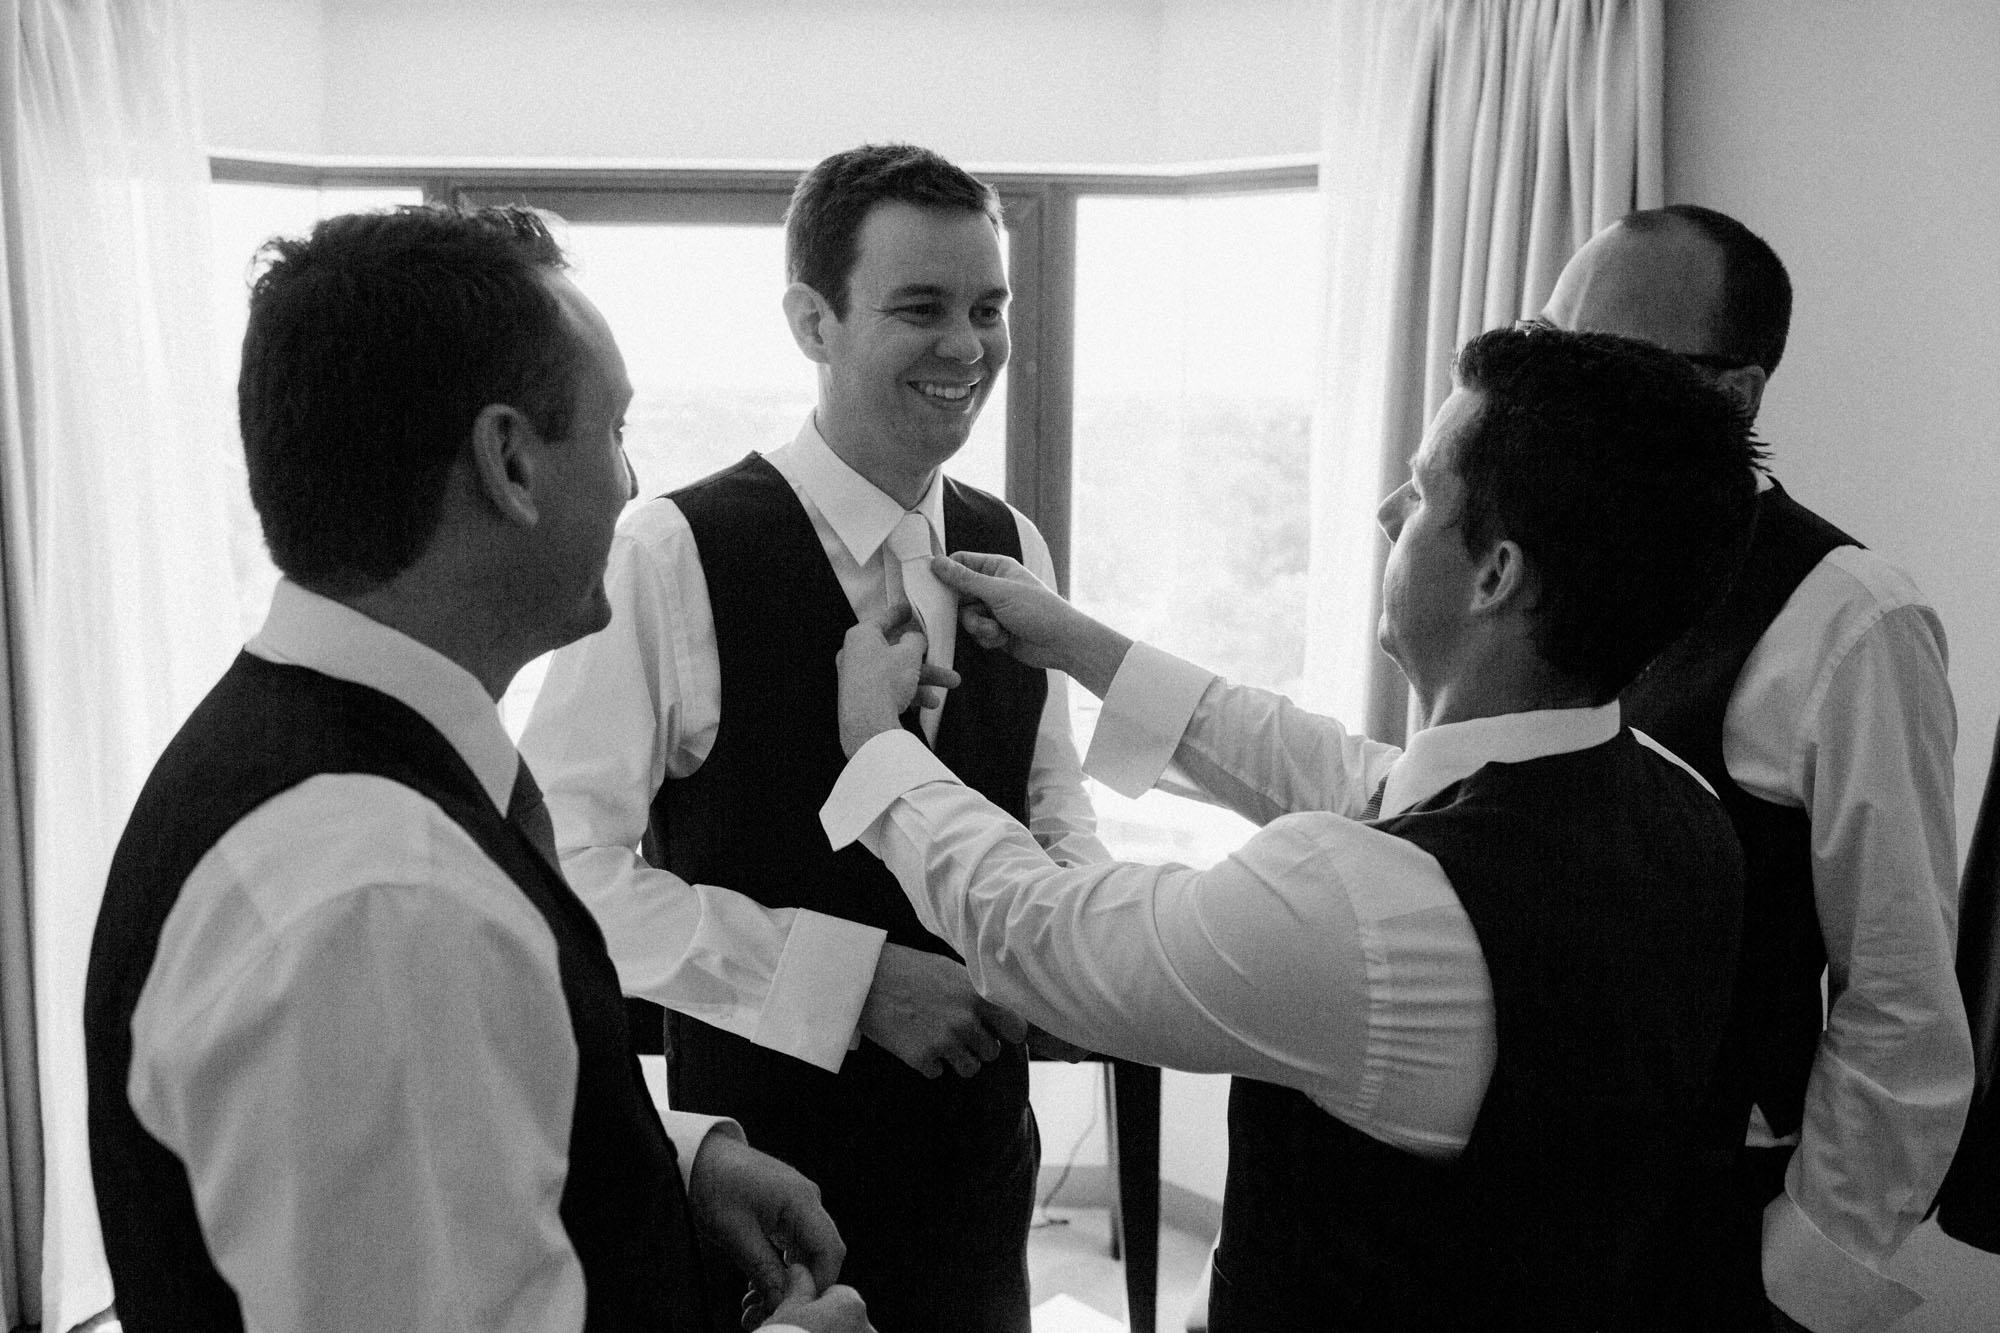 Glen-Ewin-Estate-wedding-photography-007.jpg